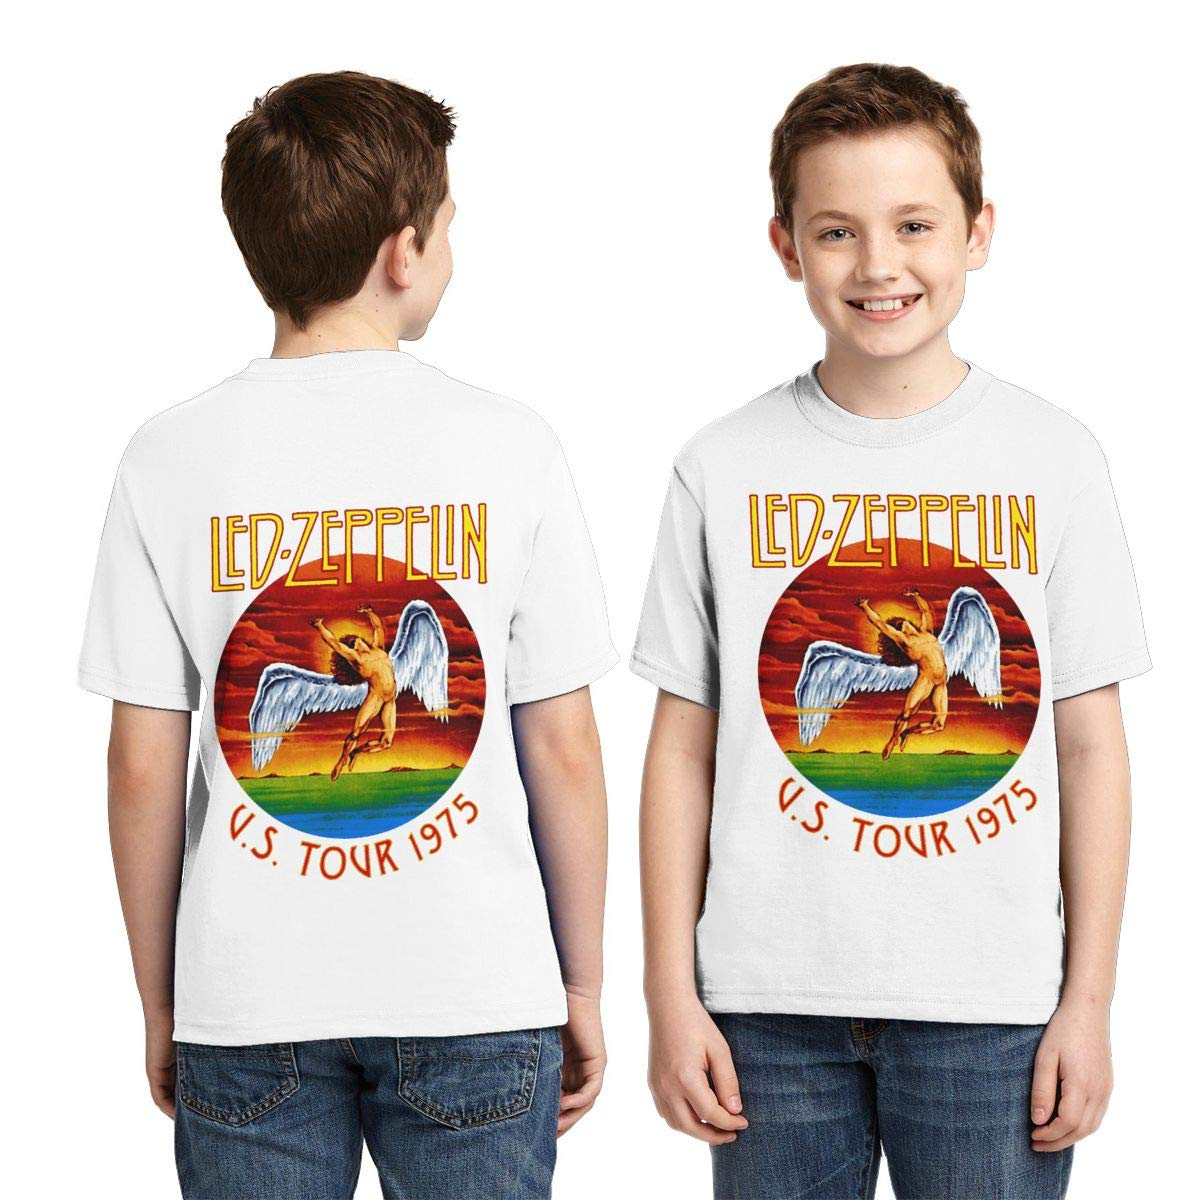 Cubics Meltdown Childrens Long Sleeve T-Shirt Boys Cotton Tee Tops